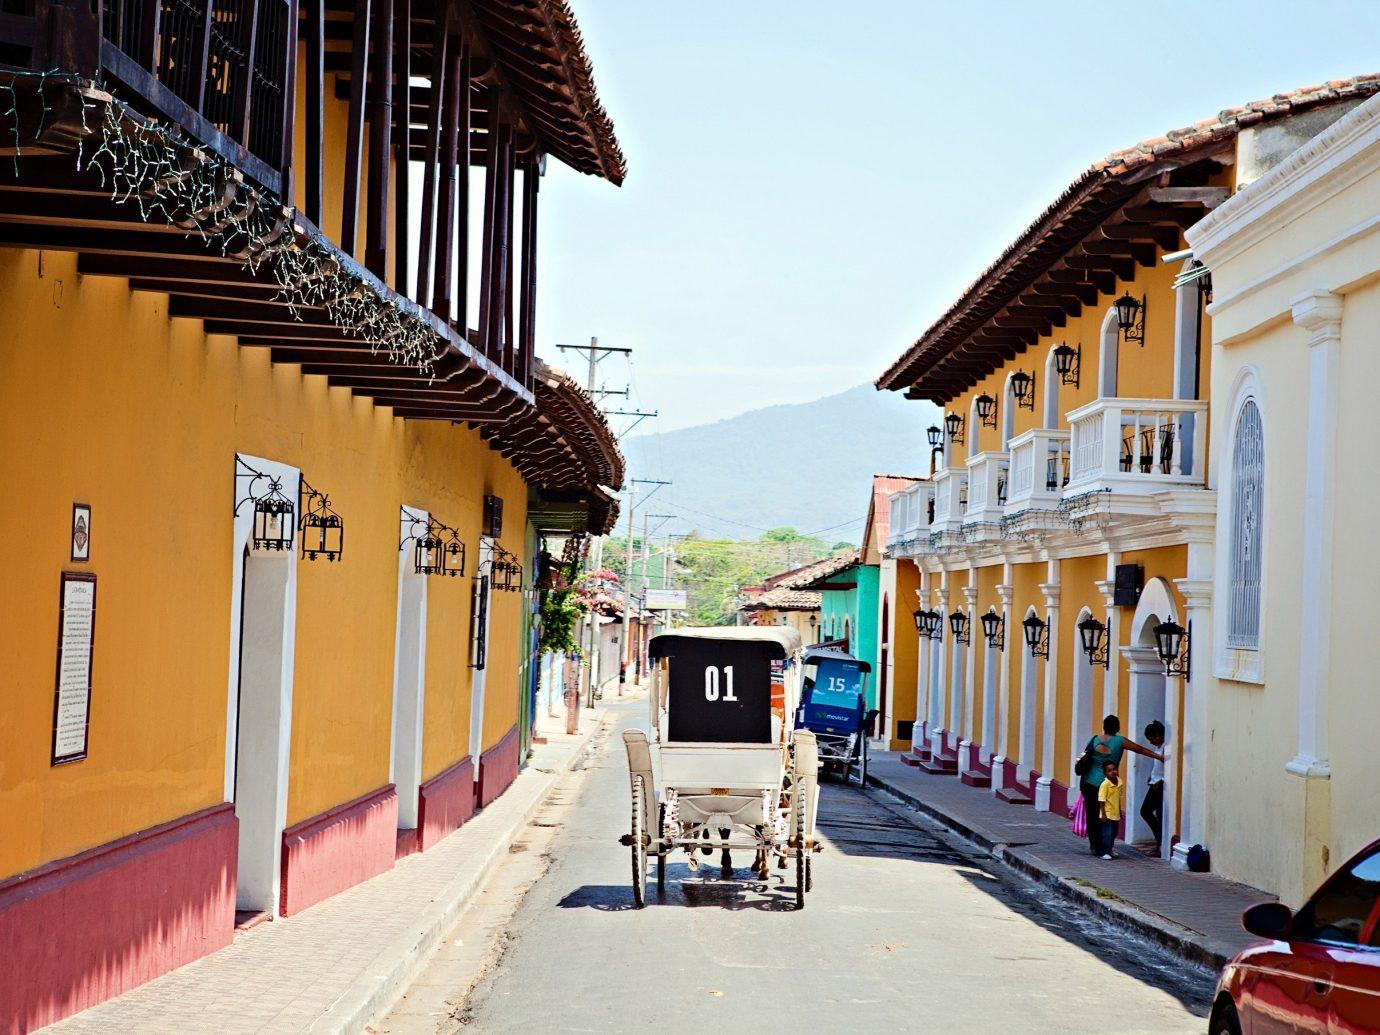 Jetsetter Guides building sky outdoor transport Town neighbourhood vacation street Architecture tourism travel boardwalk